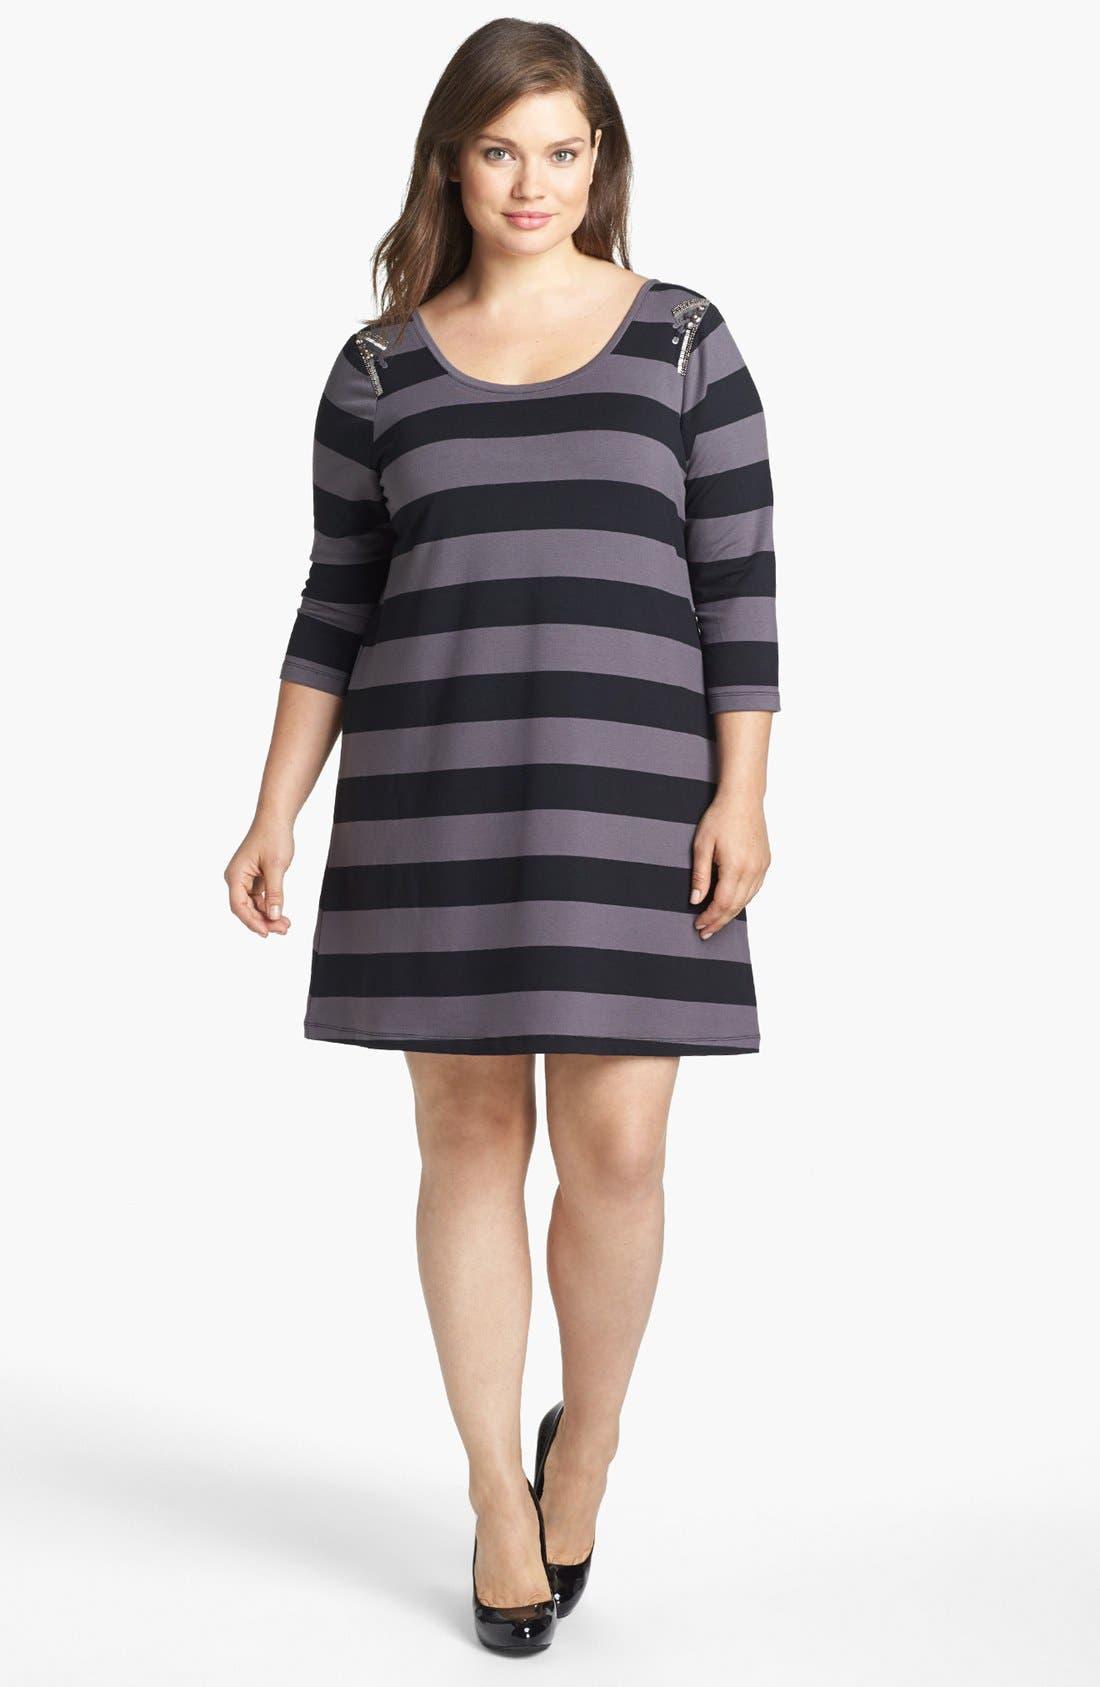 Alternate Image 1 Selected - Jessica Simpson 'Joey' Embellished Stripe Knit Dress (Plus Size)